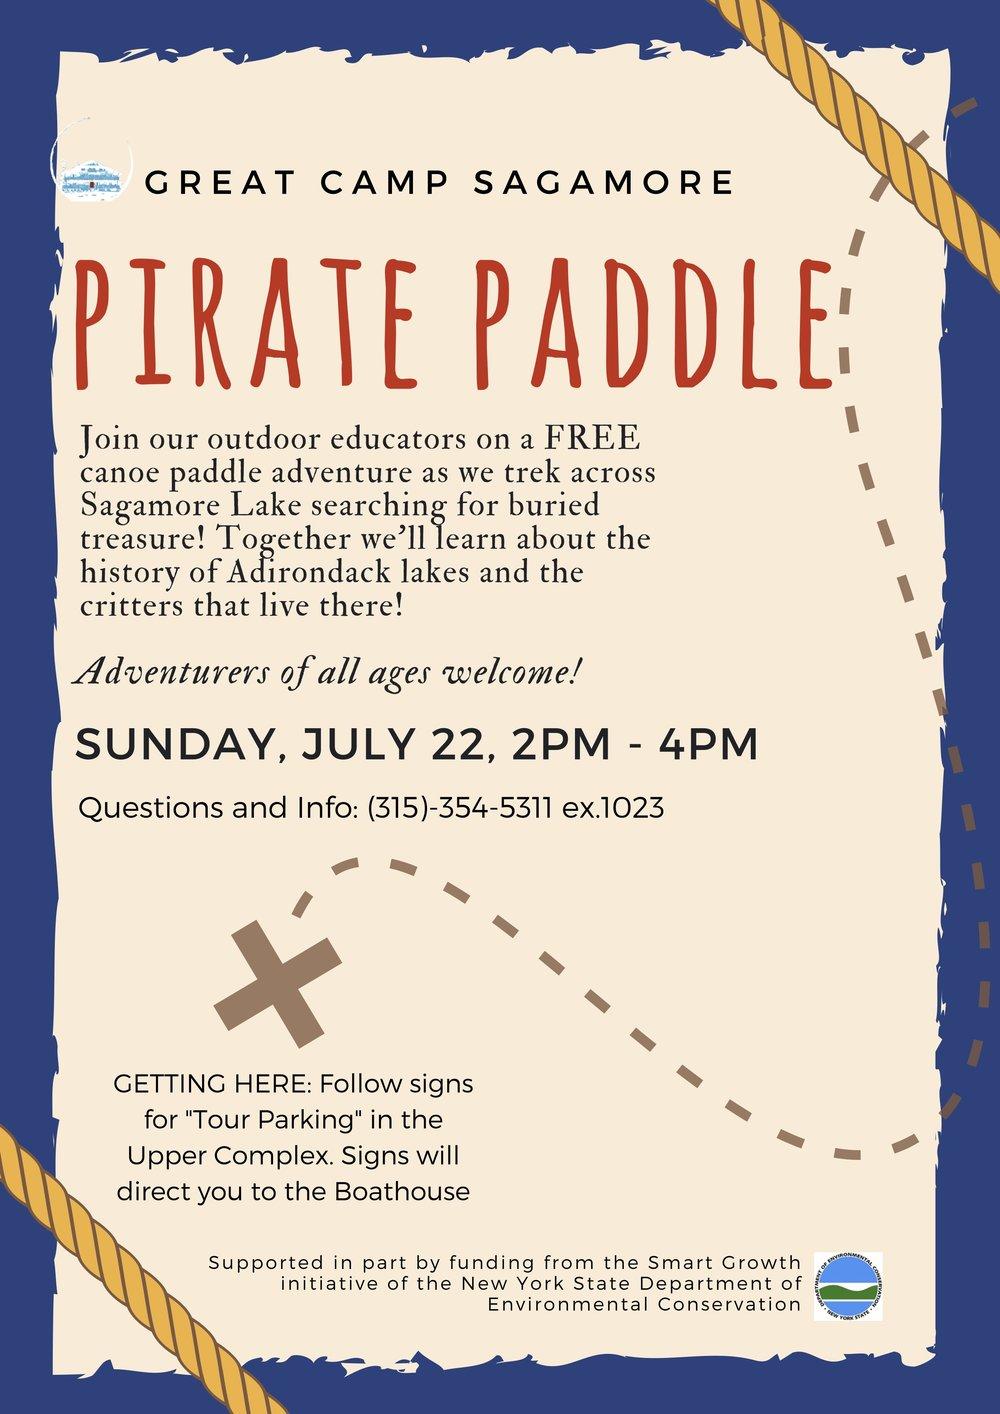 pirate paddle.jpg